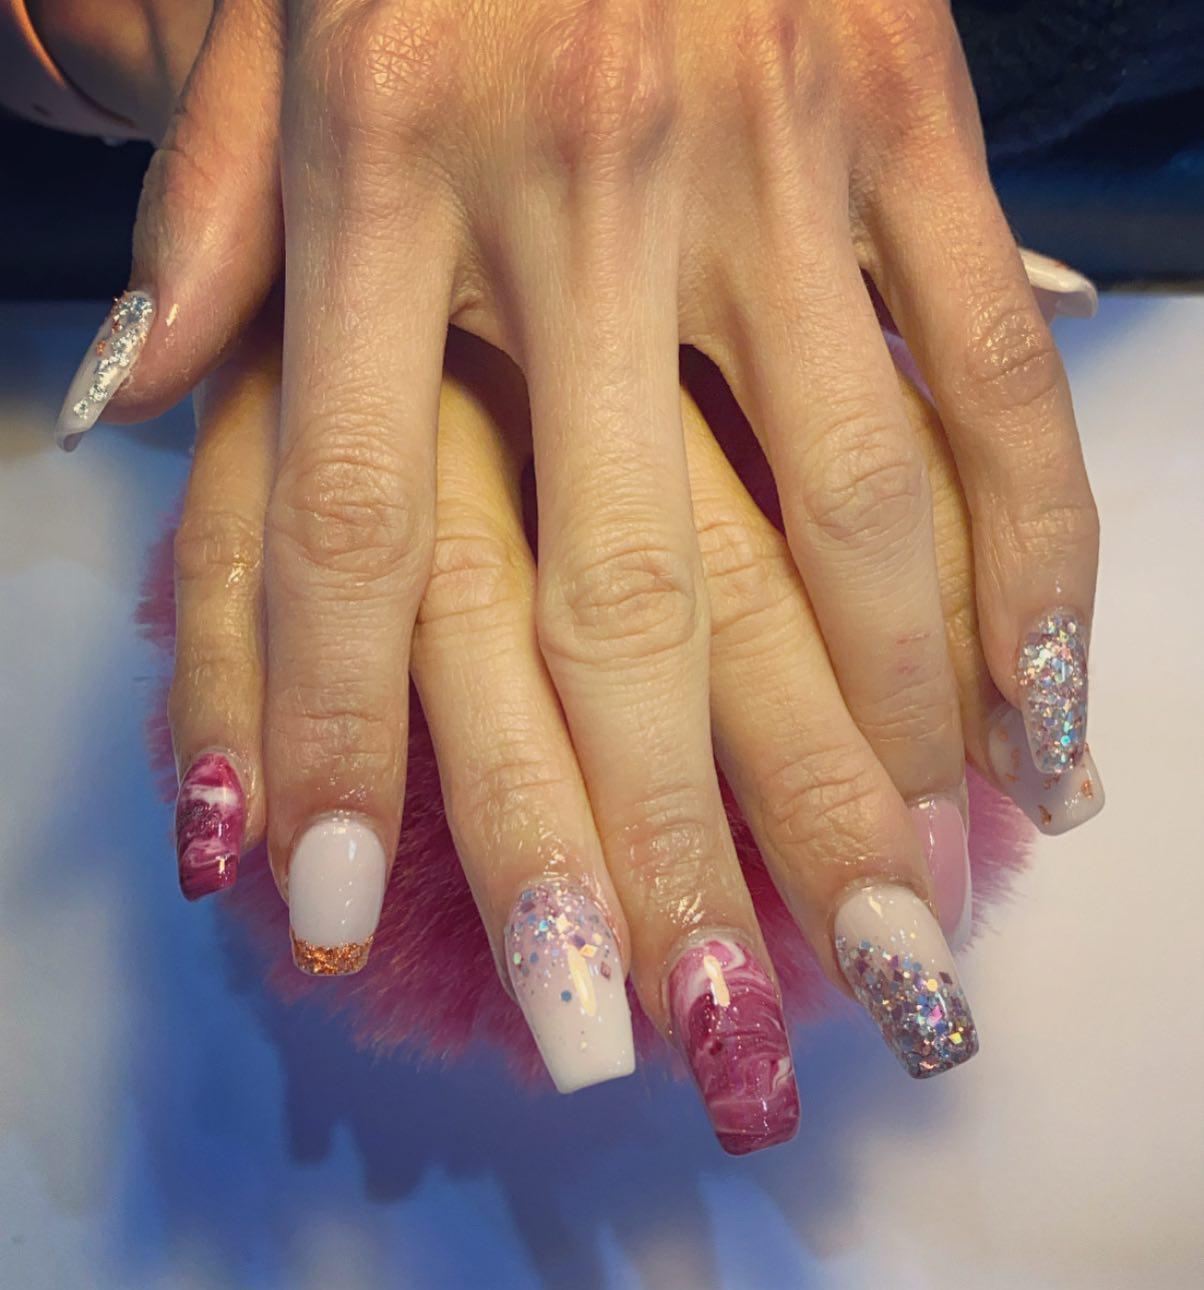 American modern nails salon, Royal Tunbridge Wells